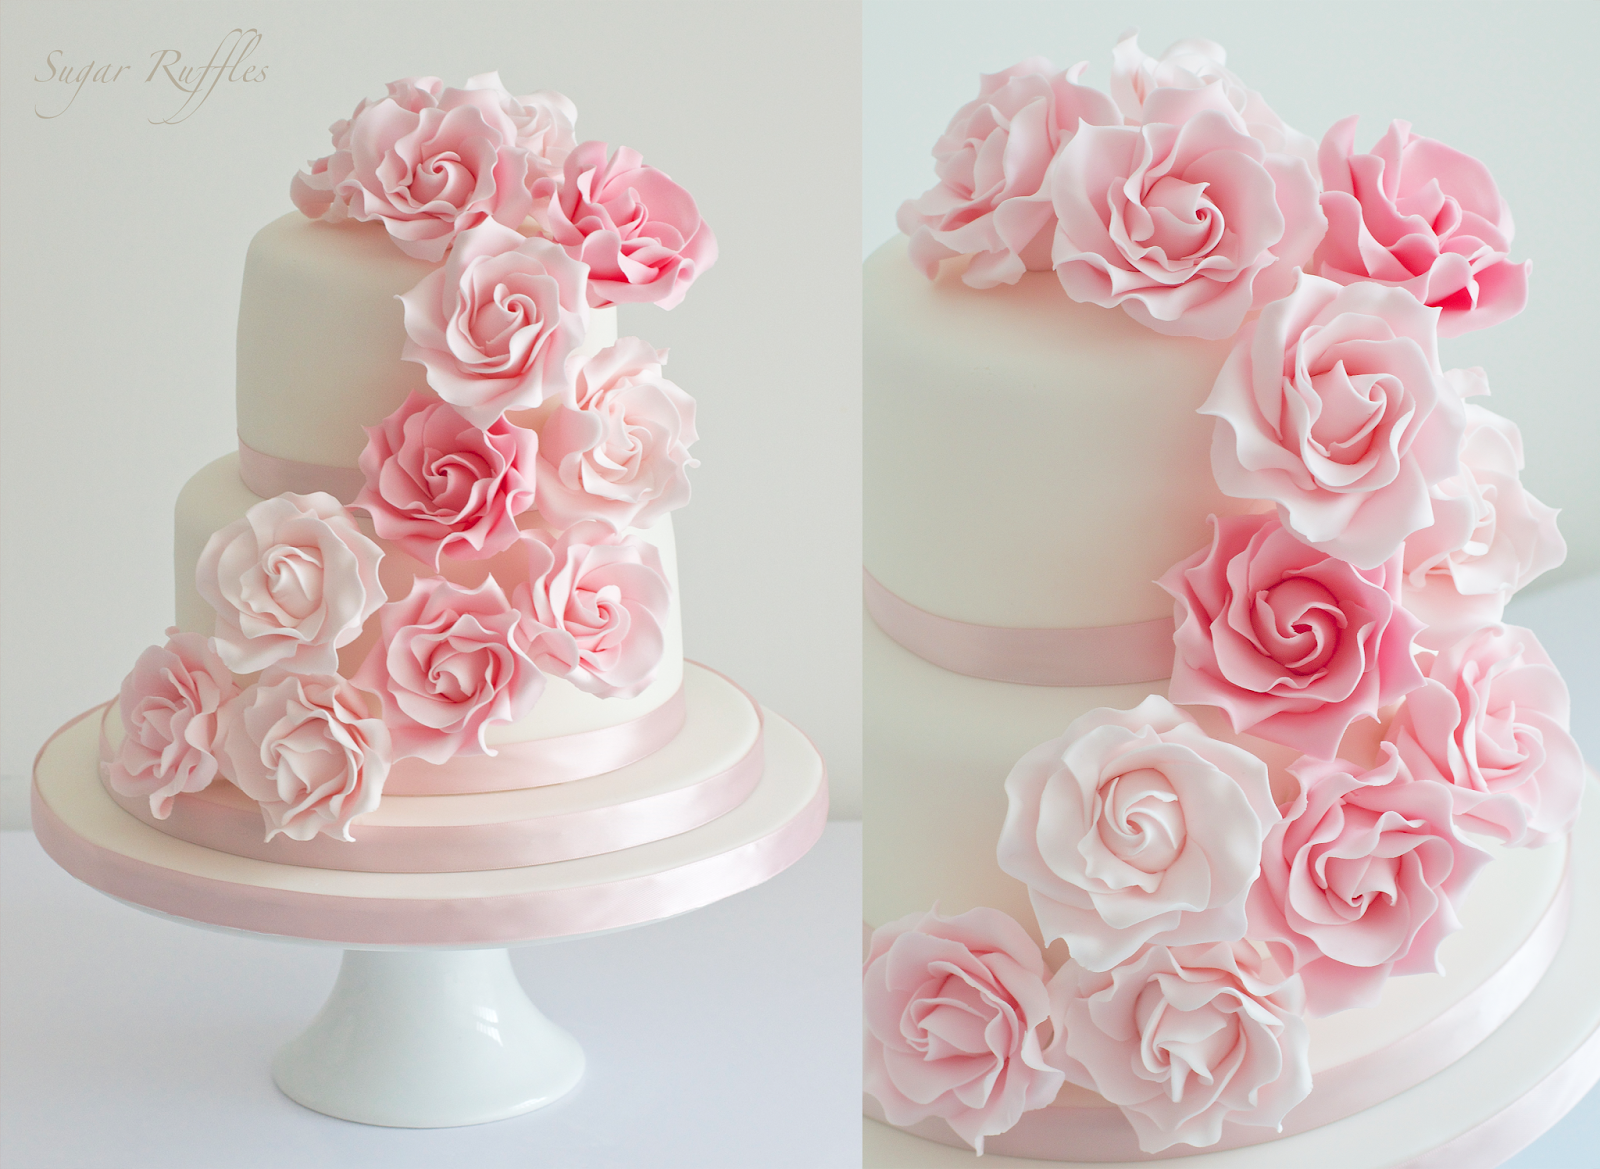 Sugar Ruffles, Elegant Wedding Cakes. Barrow in Furness and the Lake ...